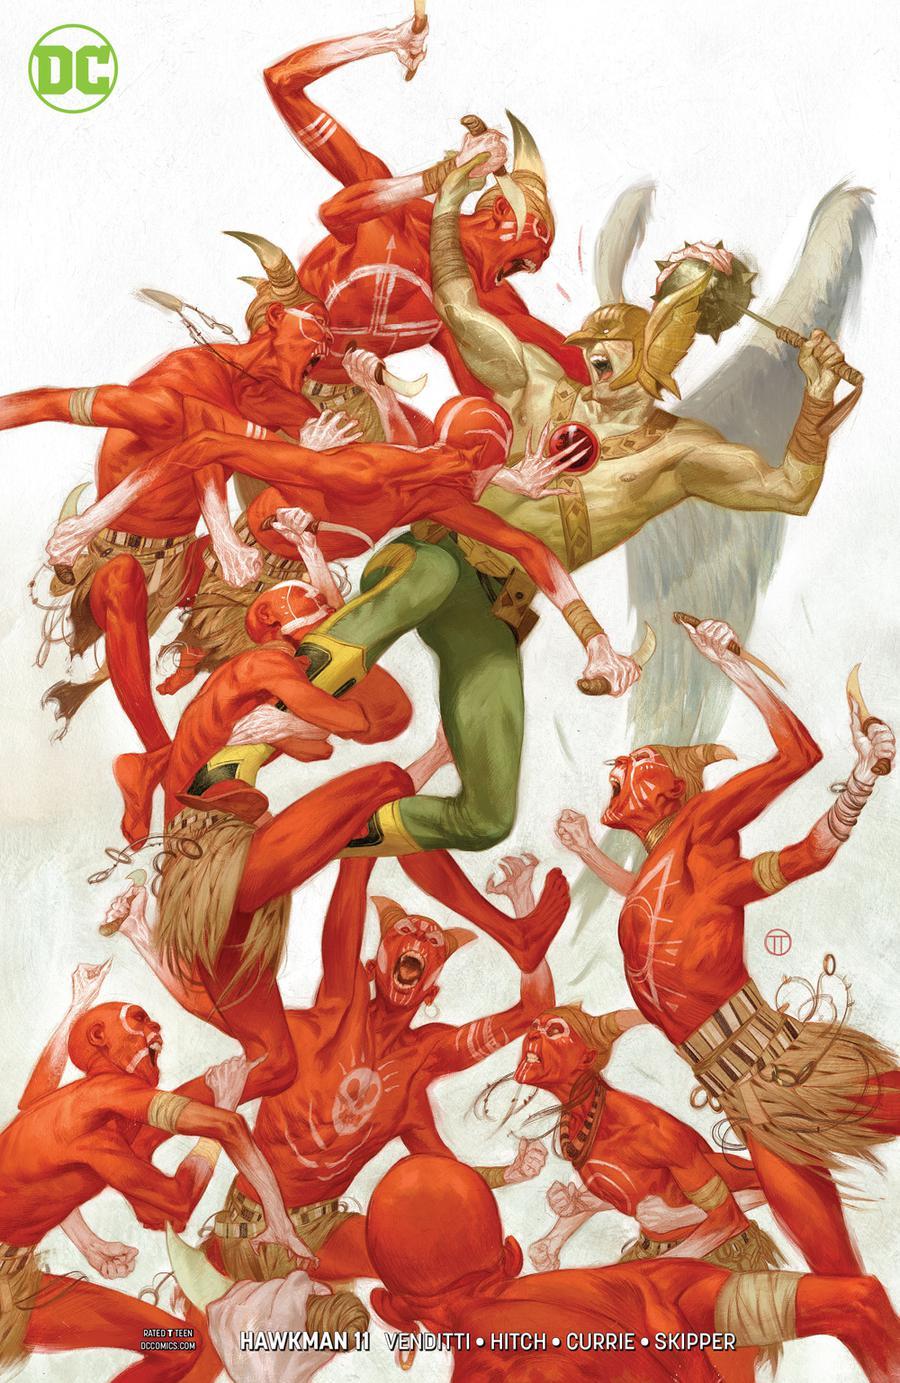 Hawkman Vol 5 #11 Cover B Variant Julian Totino Tedesco Cover